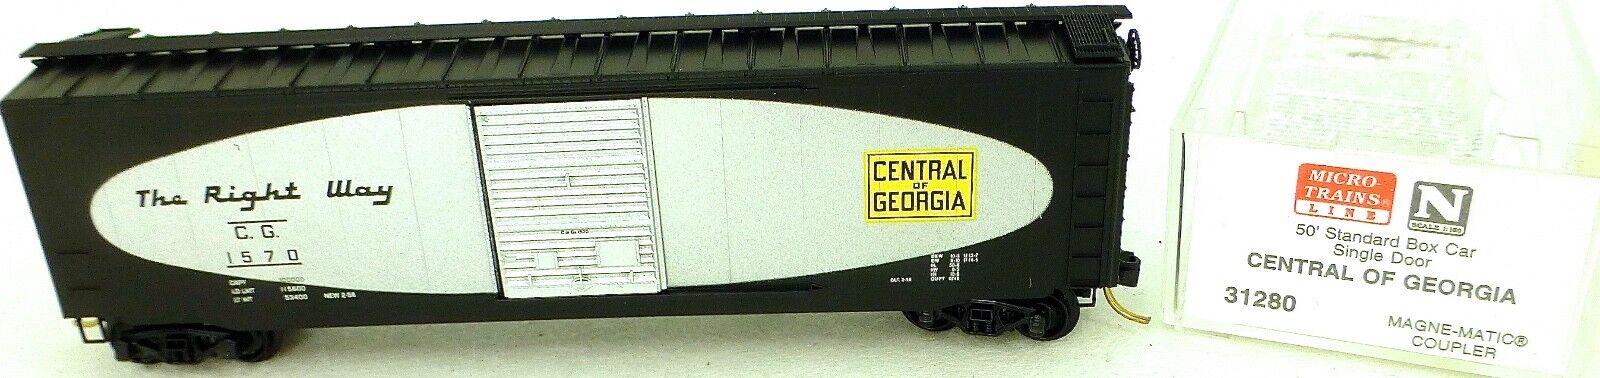 50 Standard Boxcar Central of Georgia 1570 Micro Trains Line 31280 N 1 160 C å